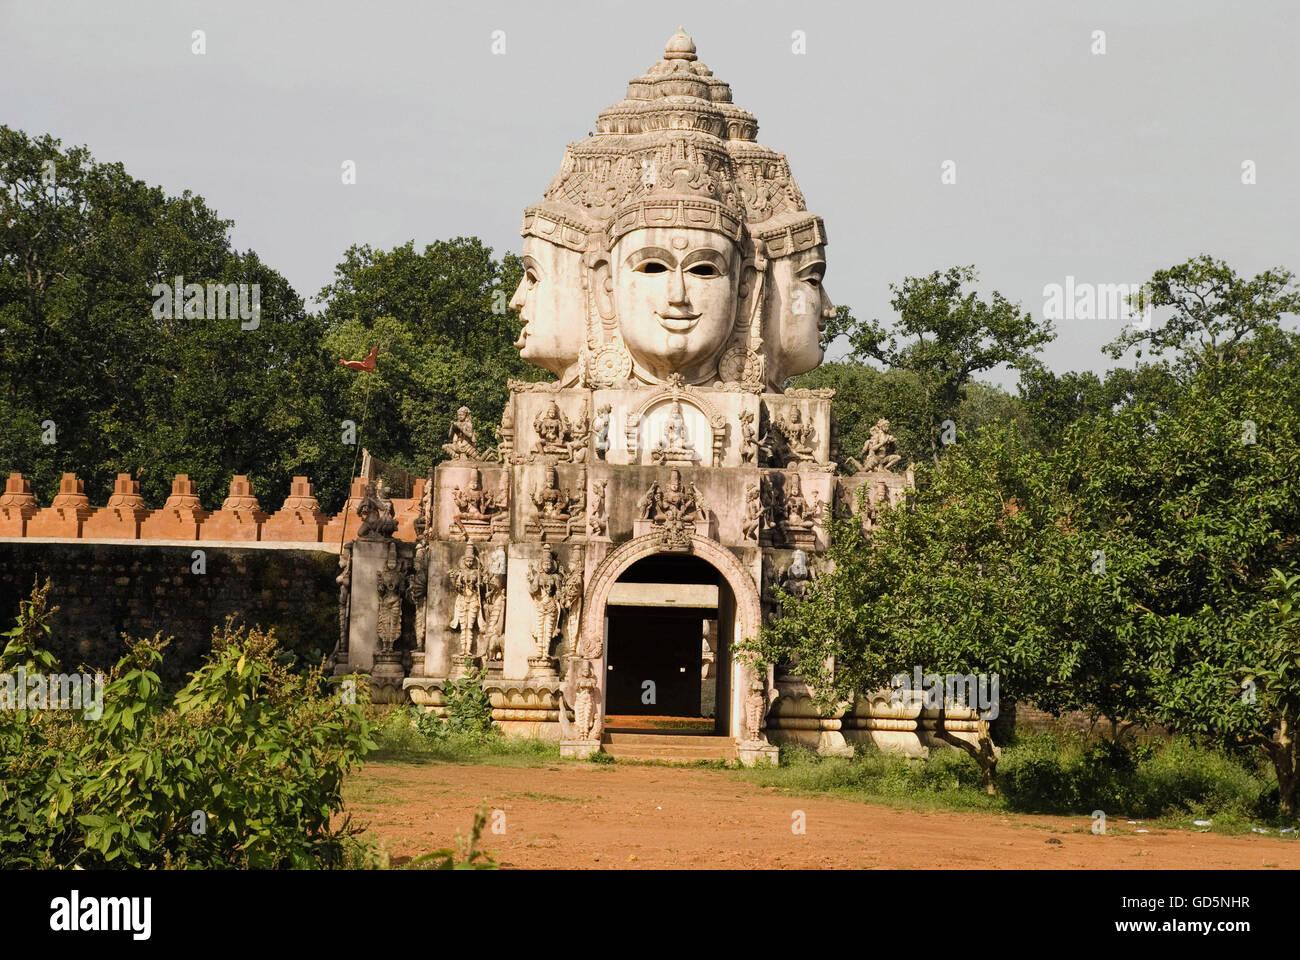 Shree Yantra Mahameru Shaktipeeth Stock Photo: 111379459 - Alamy